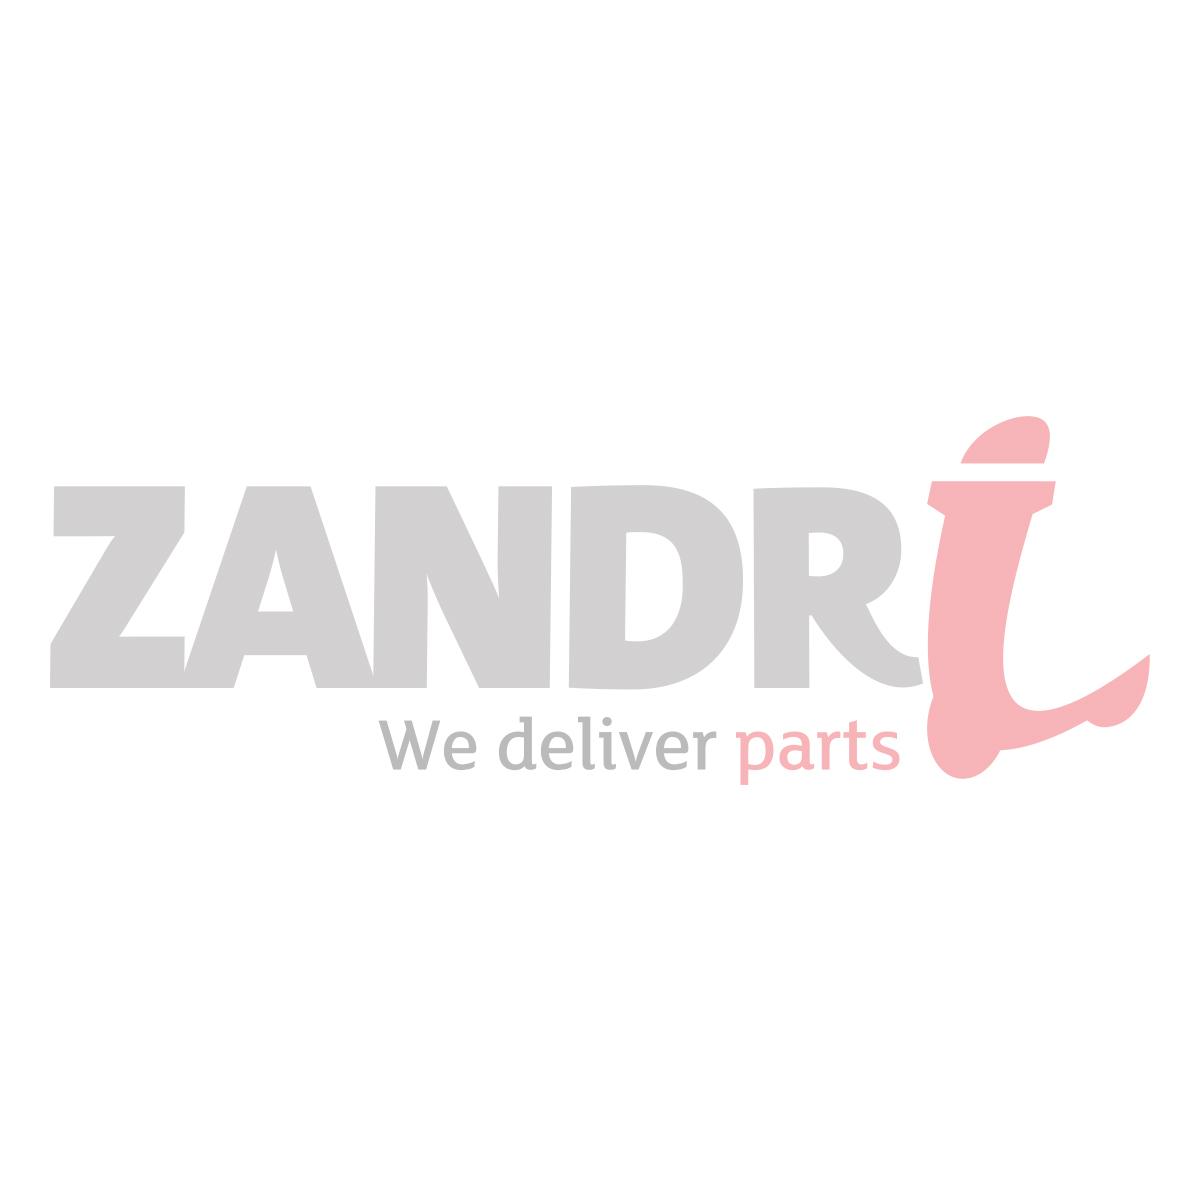 https://www.zandri.nl/media/catalog/product/cache/1/image/1200x1200/67754e084e727ef5b5973a4a9e3c5e34/s/p/sp50_33720-aca7-9000agm_kenteken_verlichting_origineel_sp_252.jpg